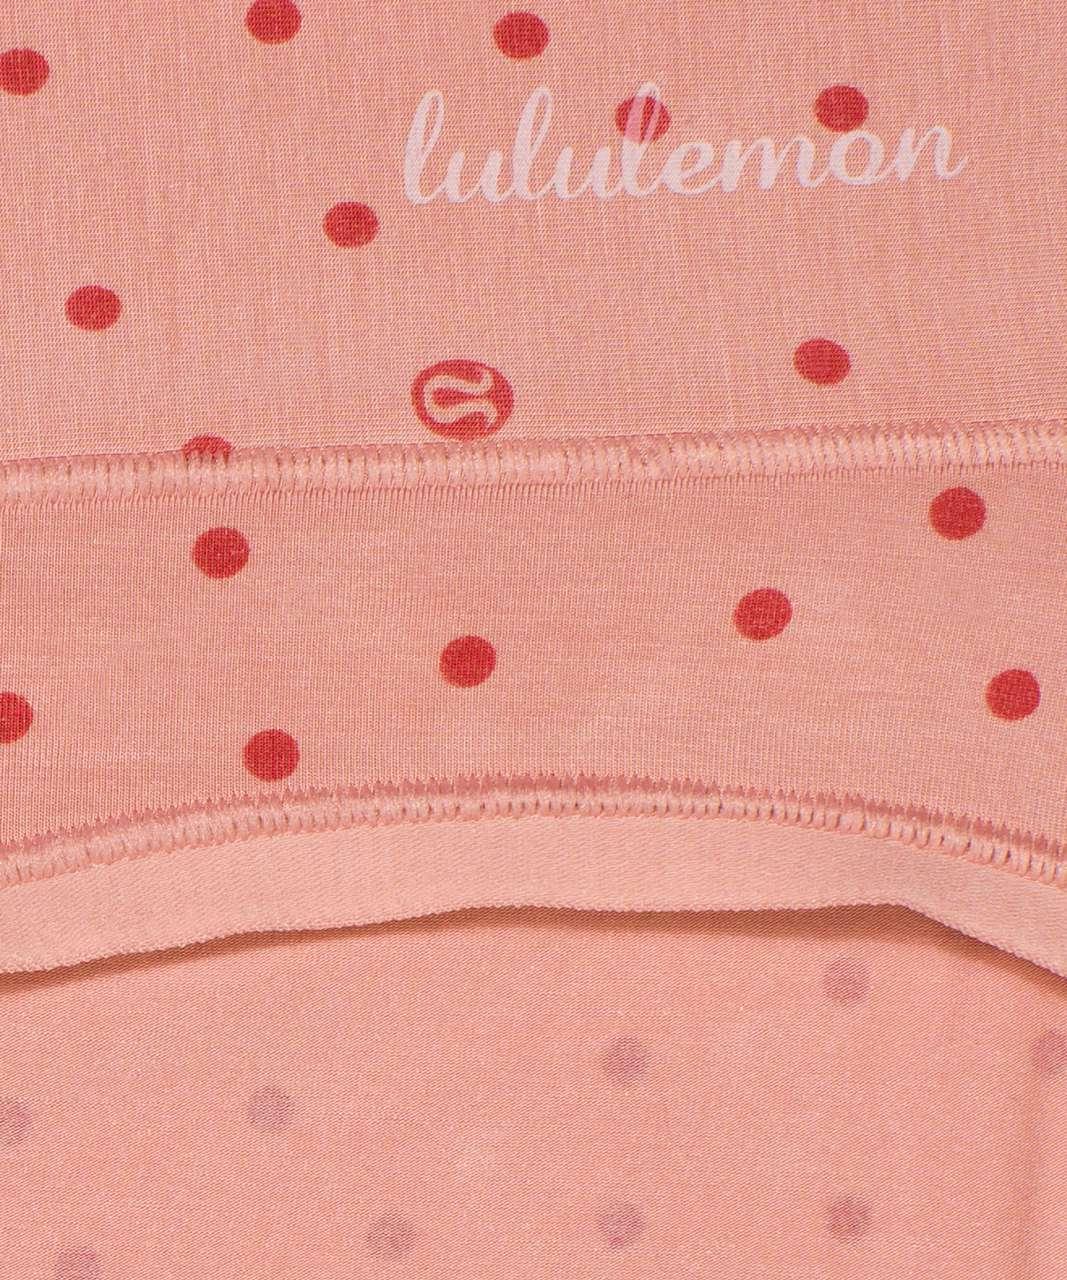 Lululemon Soft Breathable Bikini - Inspirit Polka Pink Pastel Brier Rose